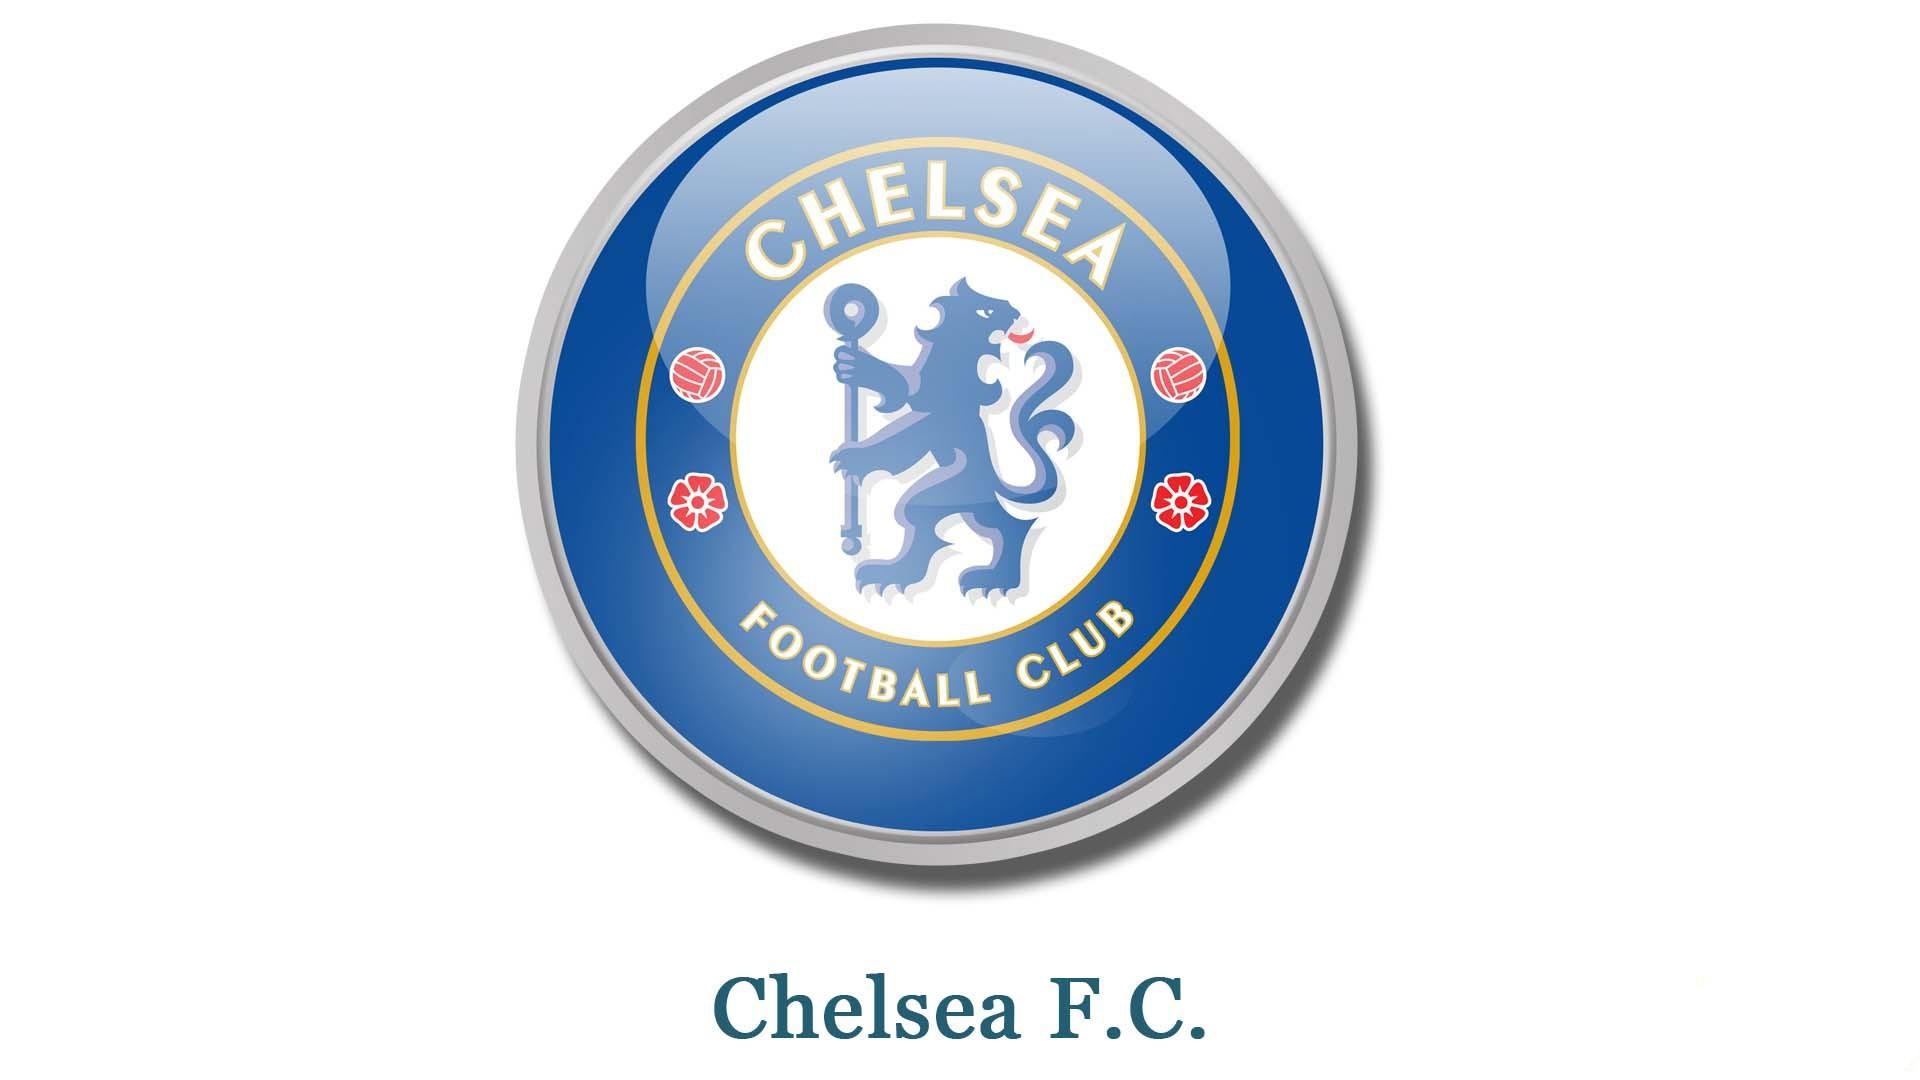 Chelsea risque gros à cause du transfert d'Andreas Christensen